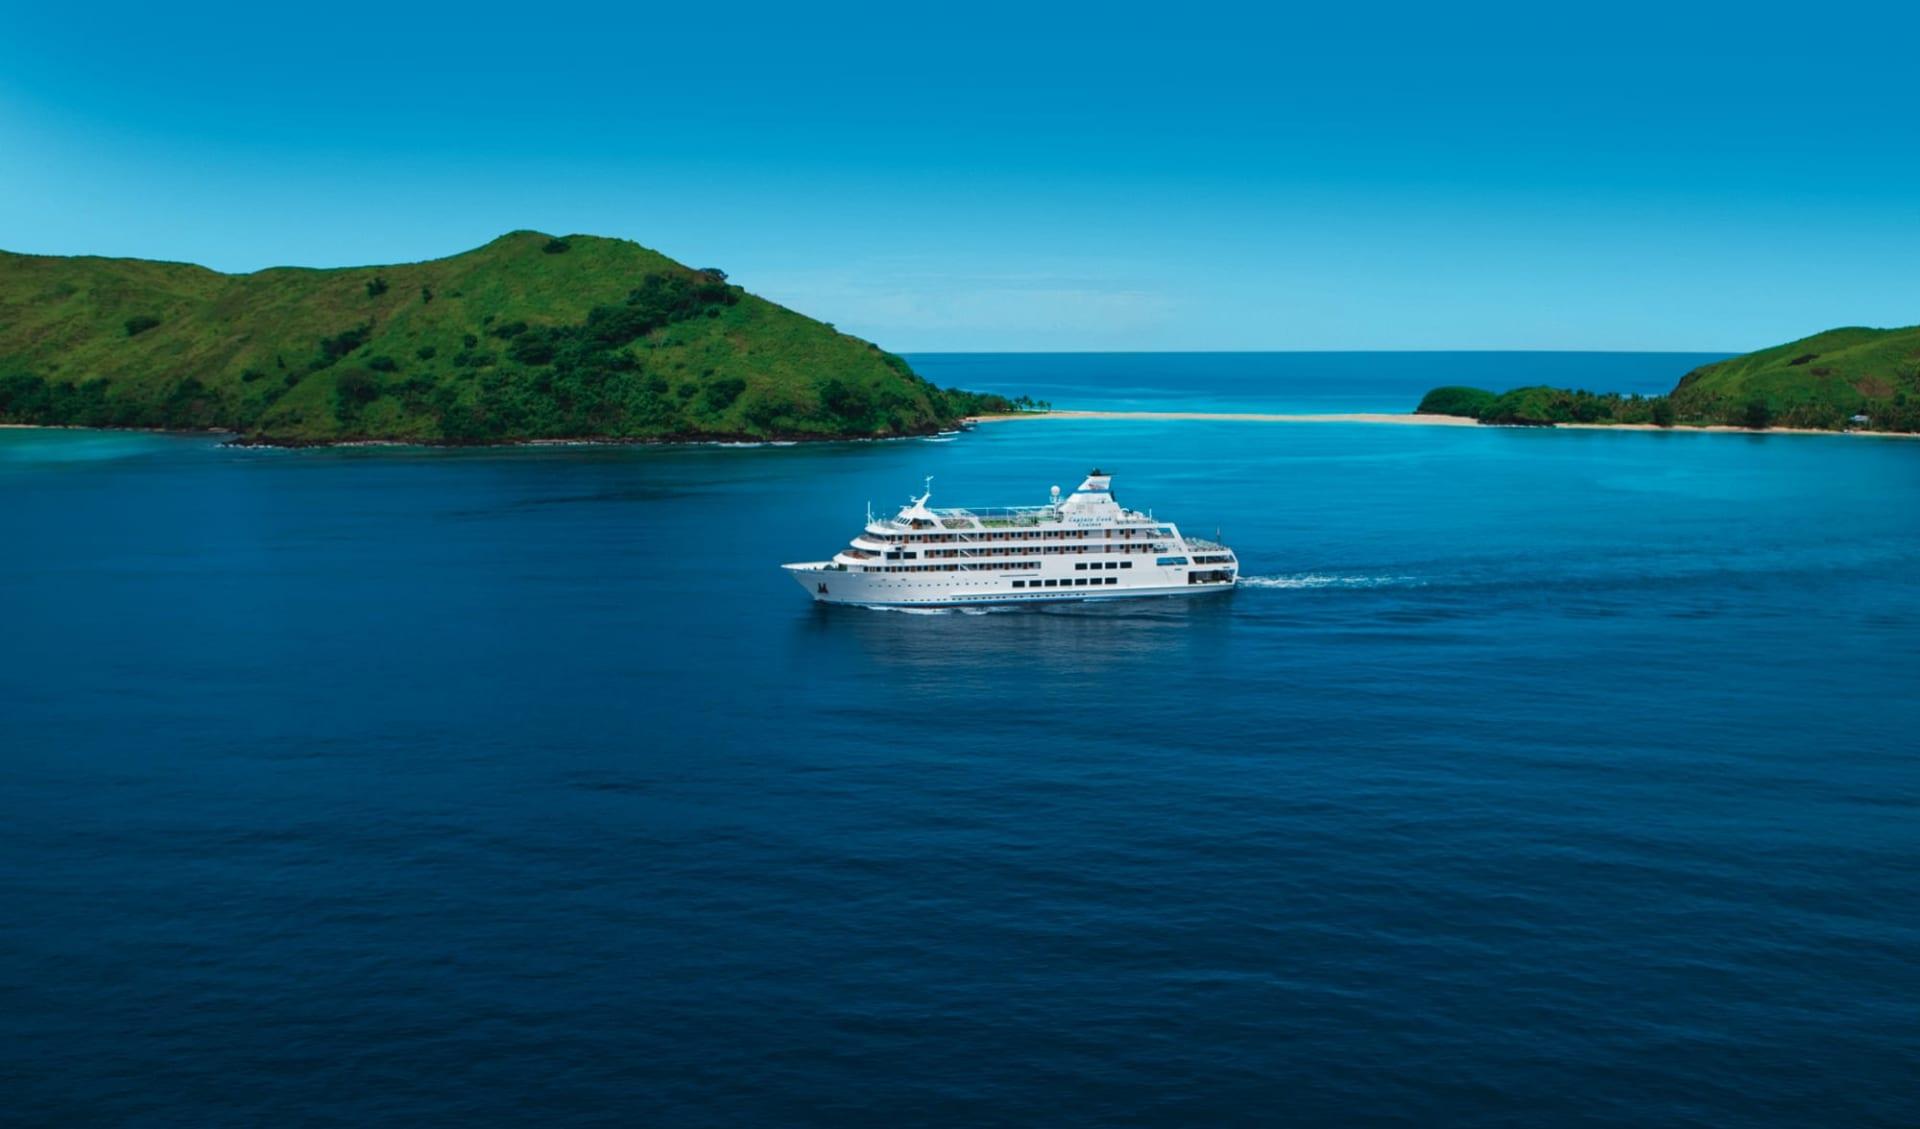 Captain Cook Cruises Lau & Kadavu Kreuzfahrt 12 Tage ab Port Denarau: Fiji - Captain Cook Cruise Schiff - Reef Endeavour